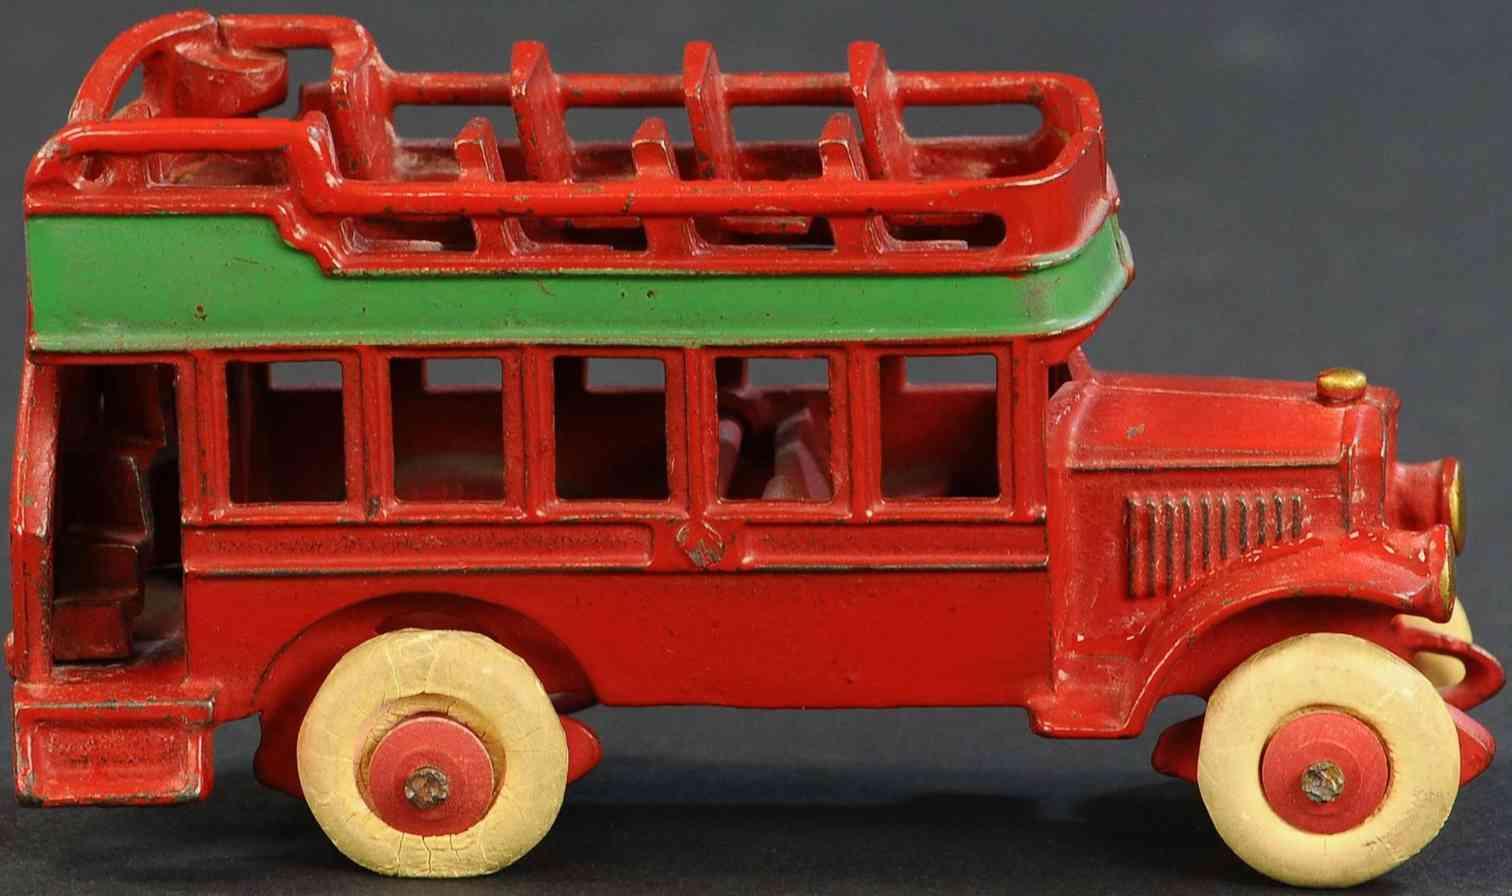 kenton hardware co 519 spielzeug gusseisen doppeldeckerbus figuren rot